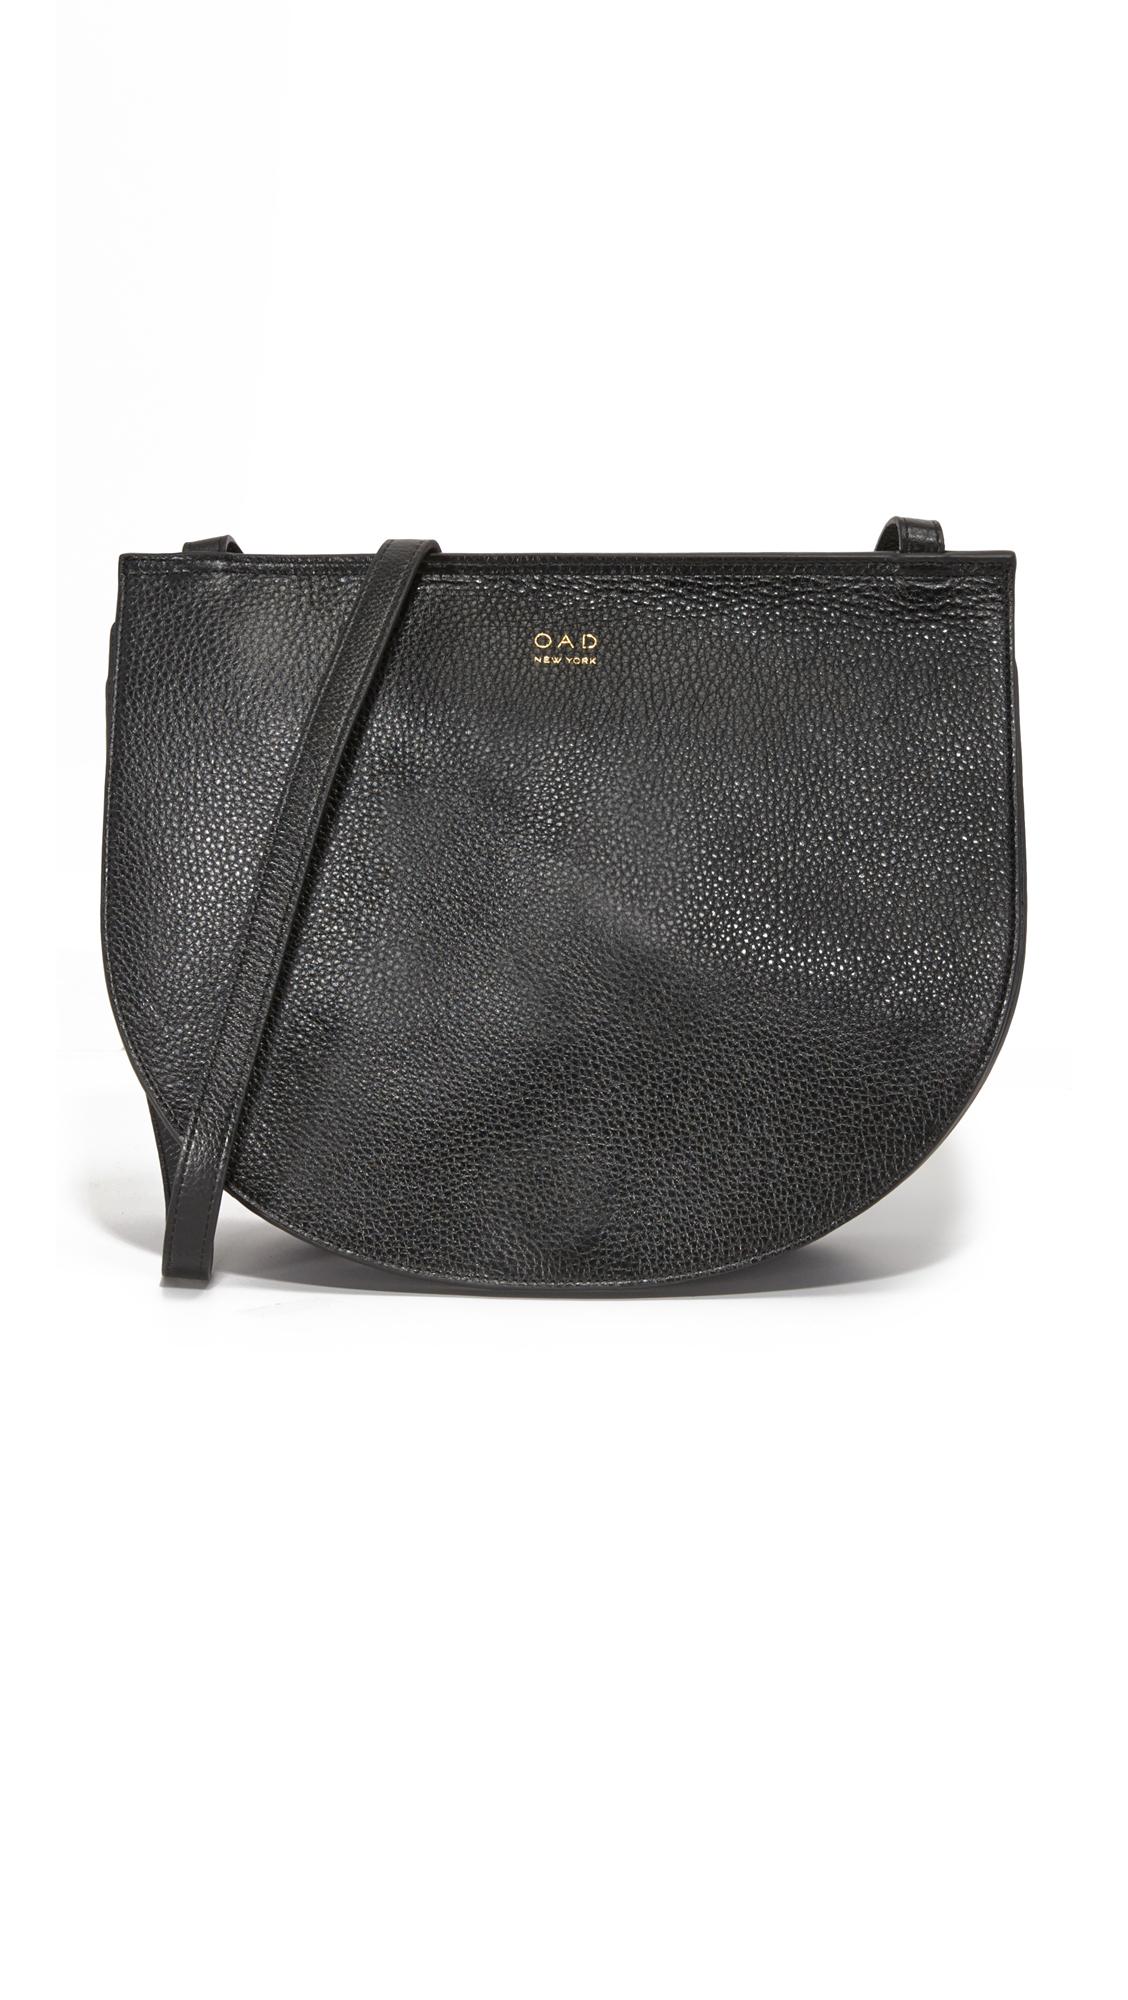 oad female 188971 oad saddle bag black